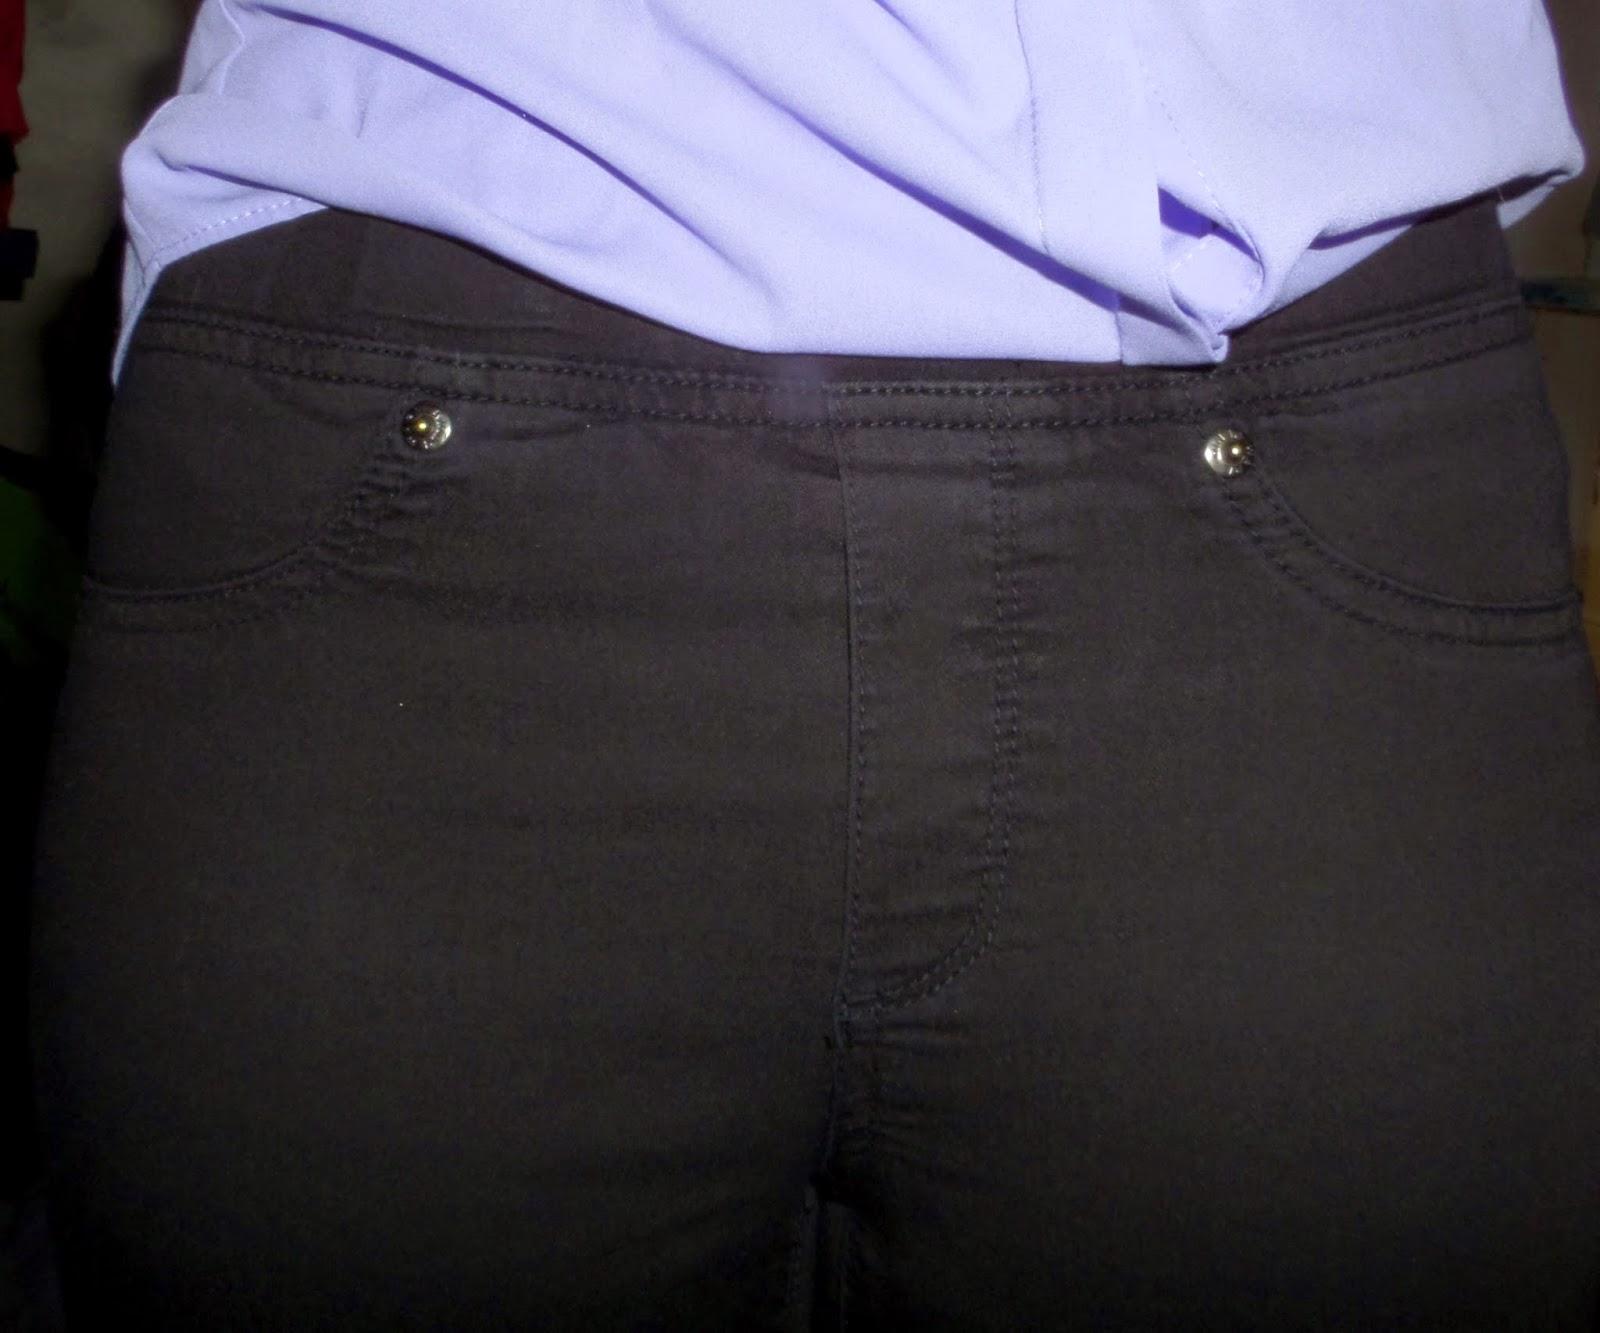 DIY: Restoring Faded Black Jeans